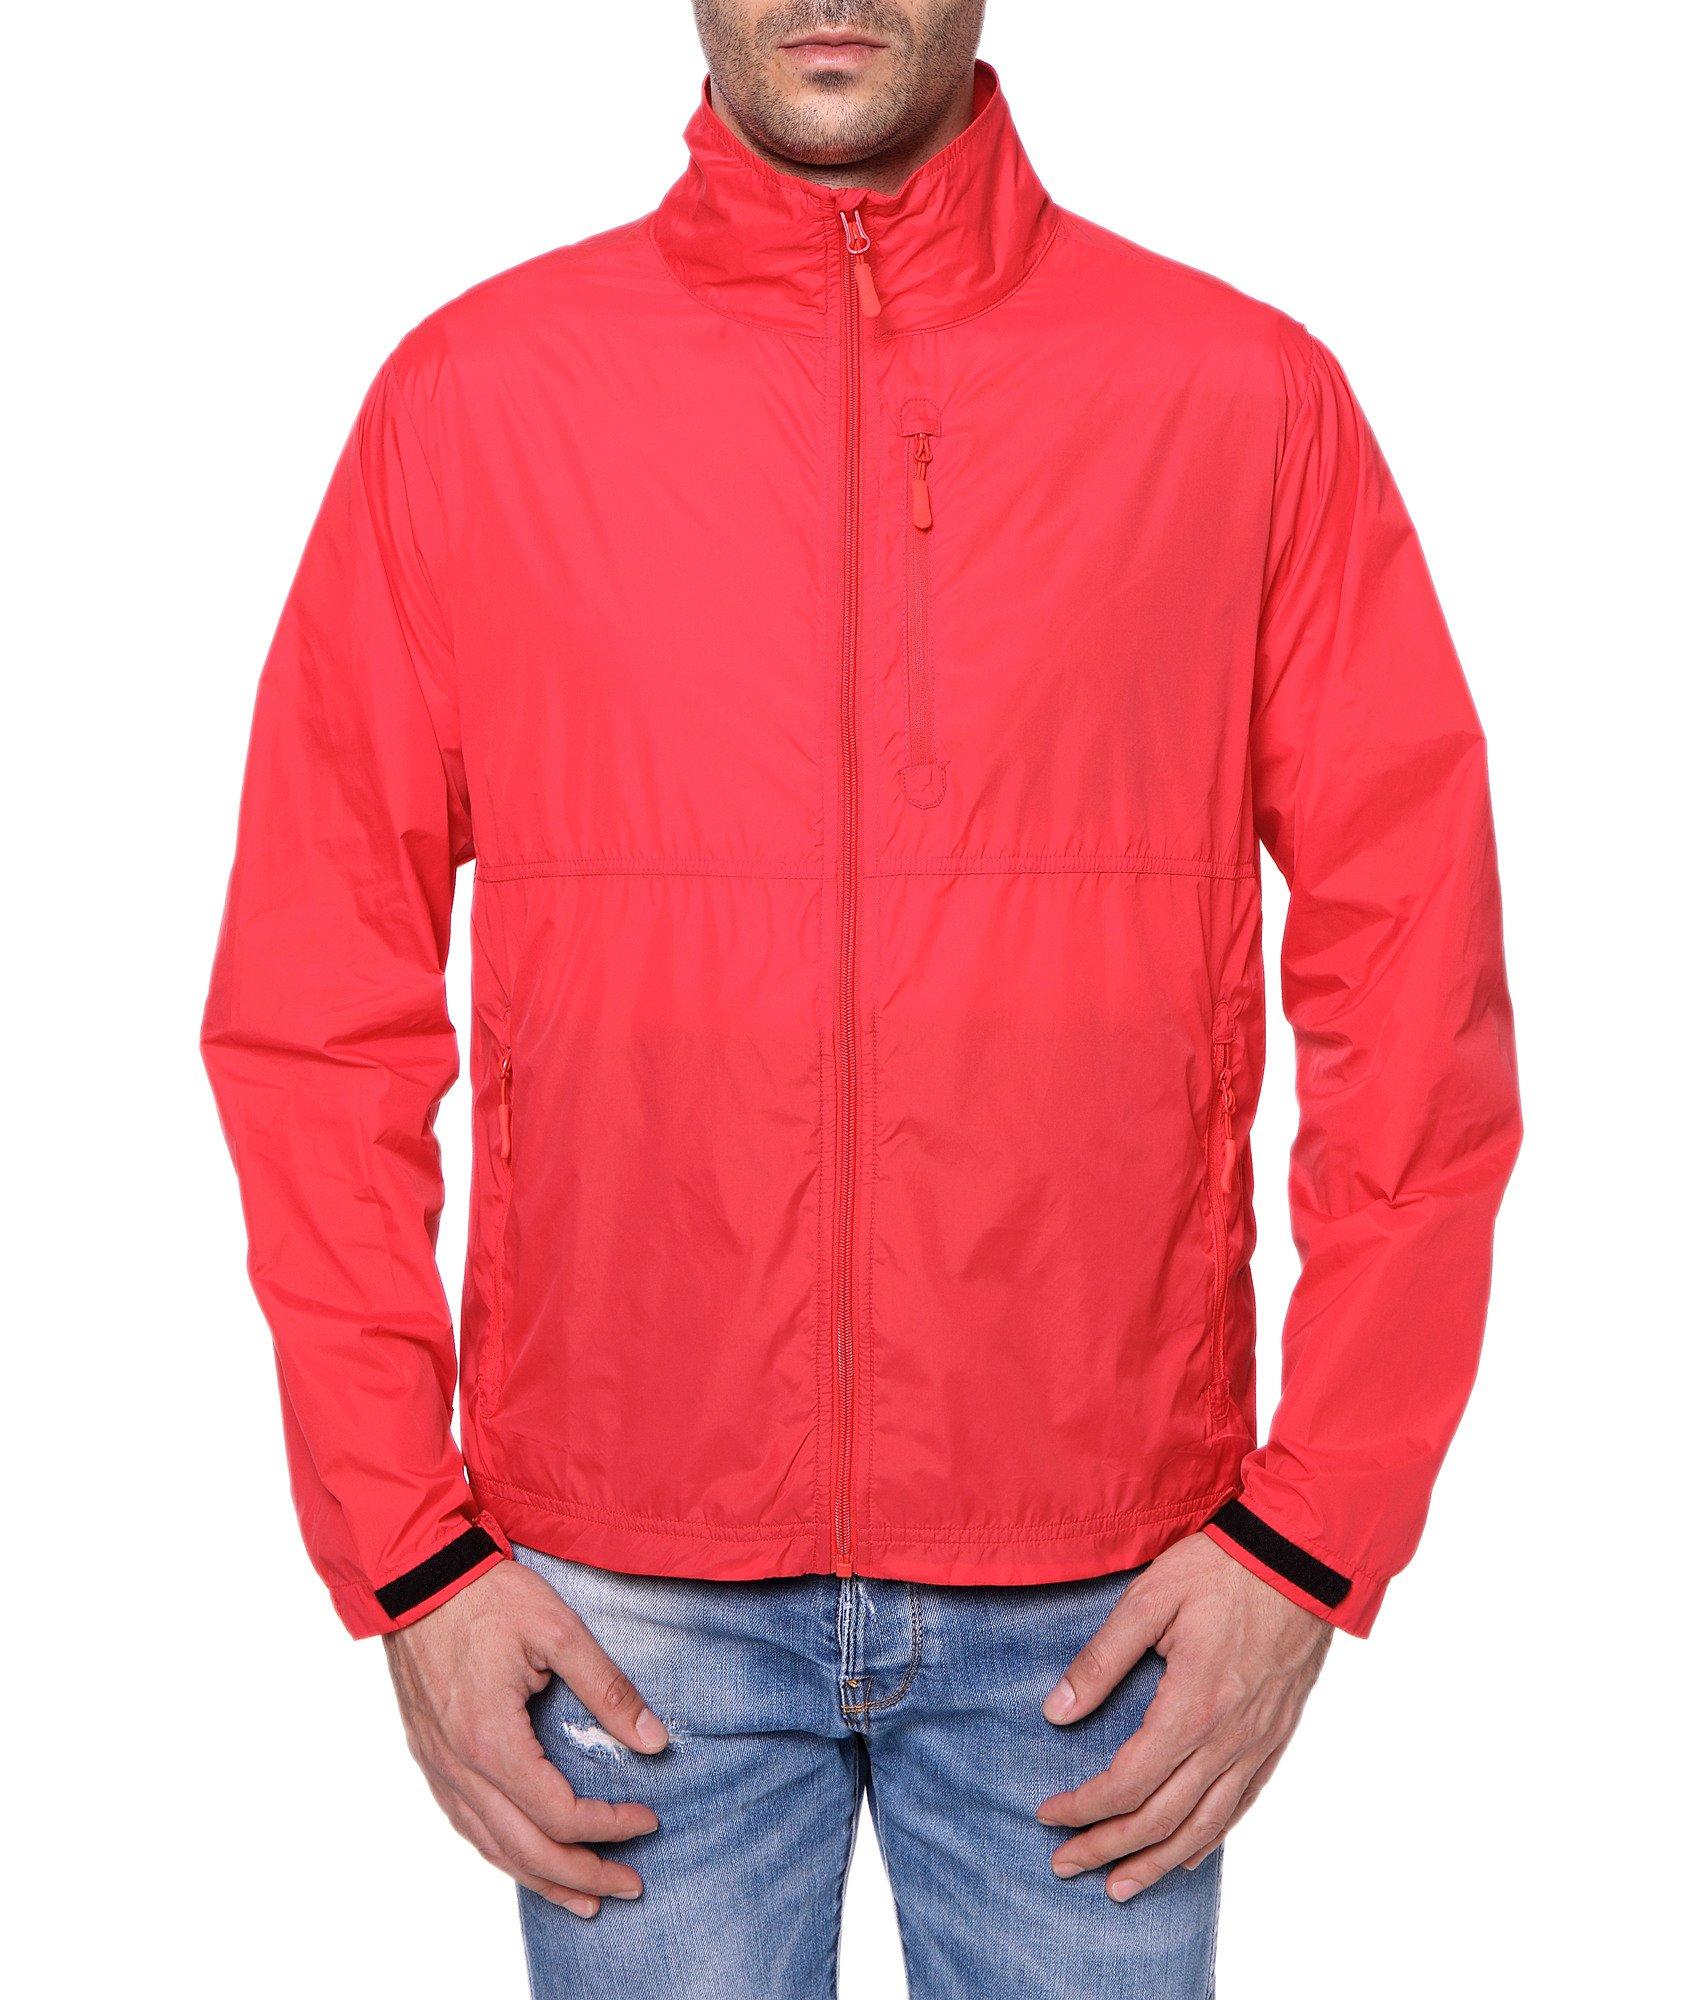 Trailside Supply Co. Men's Standard Water-Resistant Nylon Windbreaker Front-Zip up Jacket, Mars Red, Medium